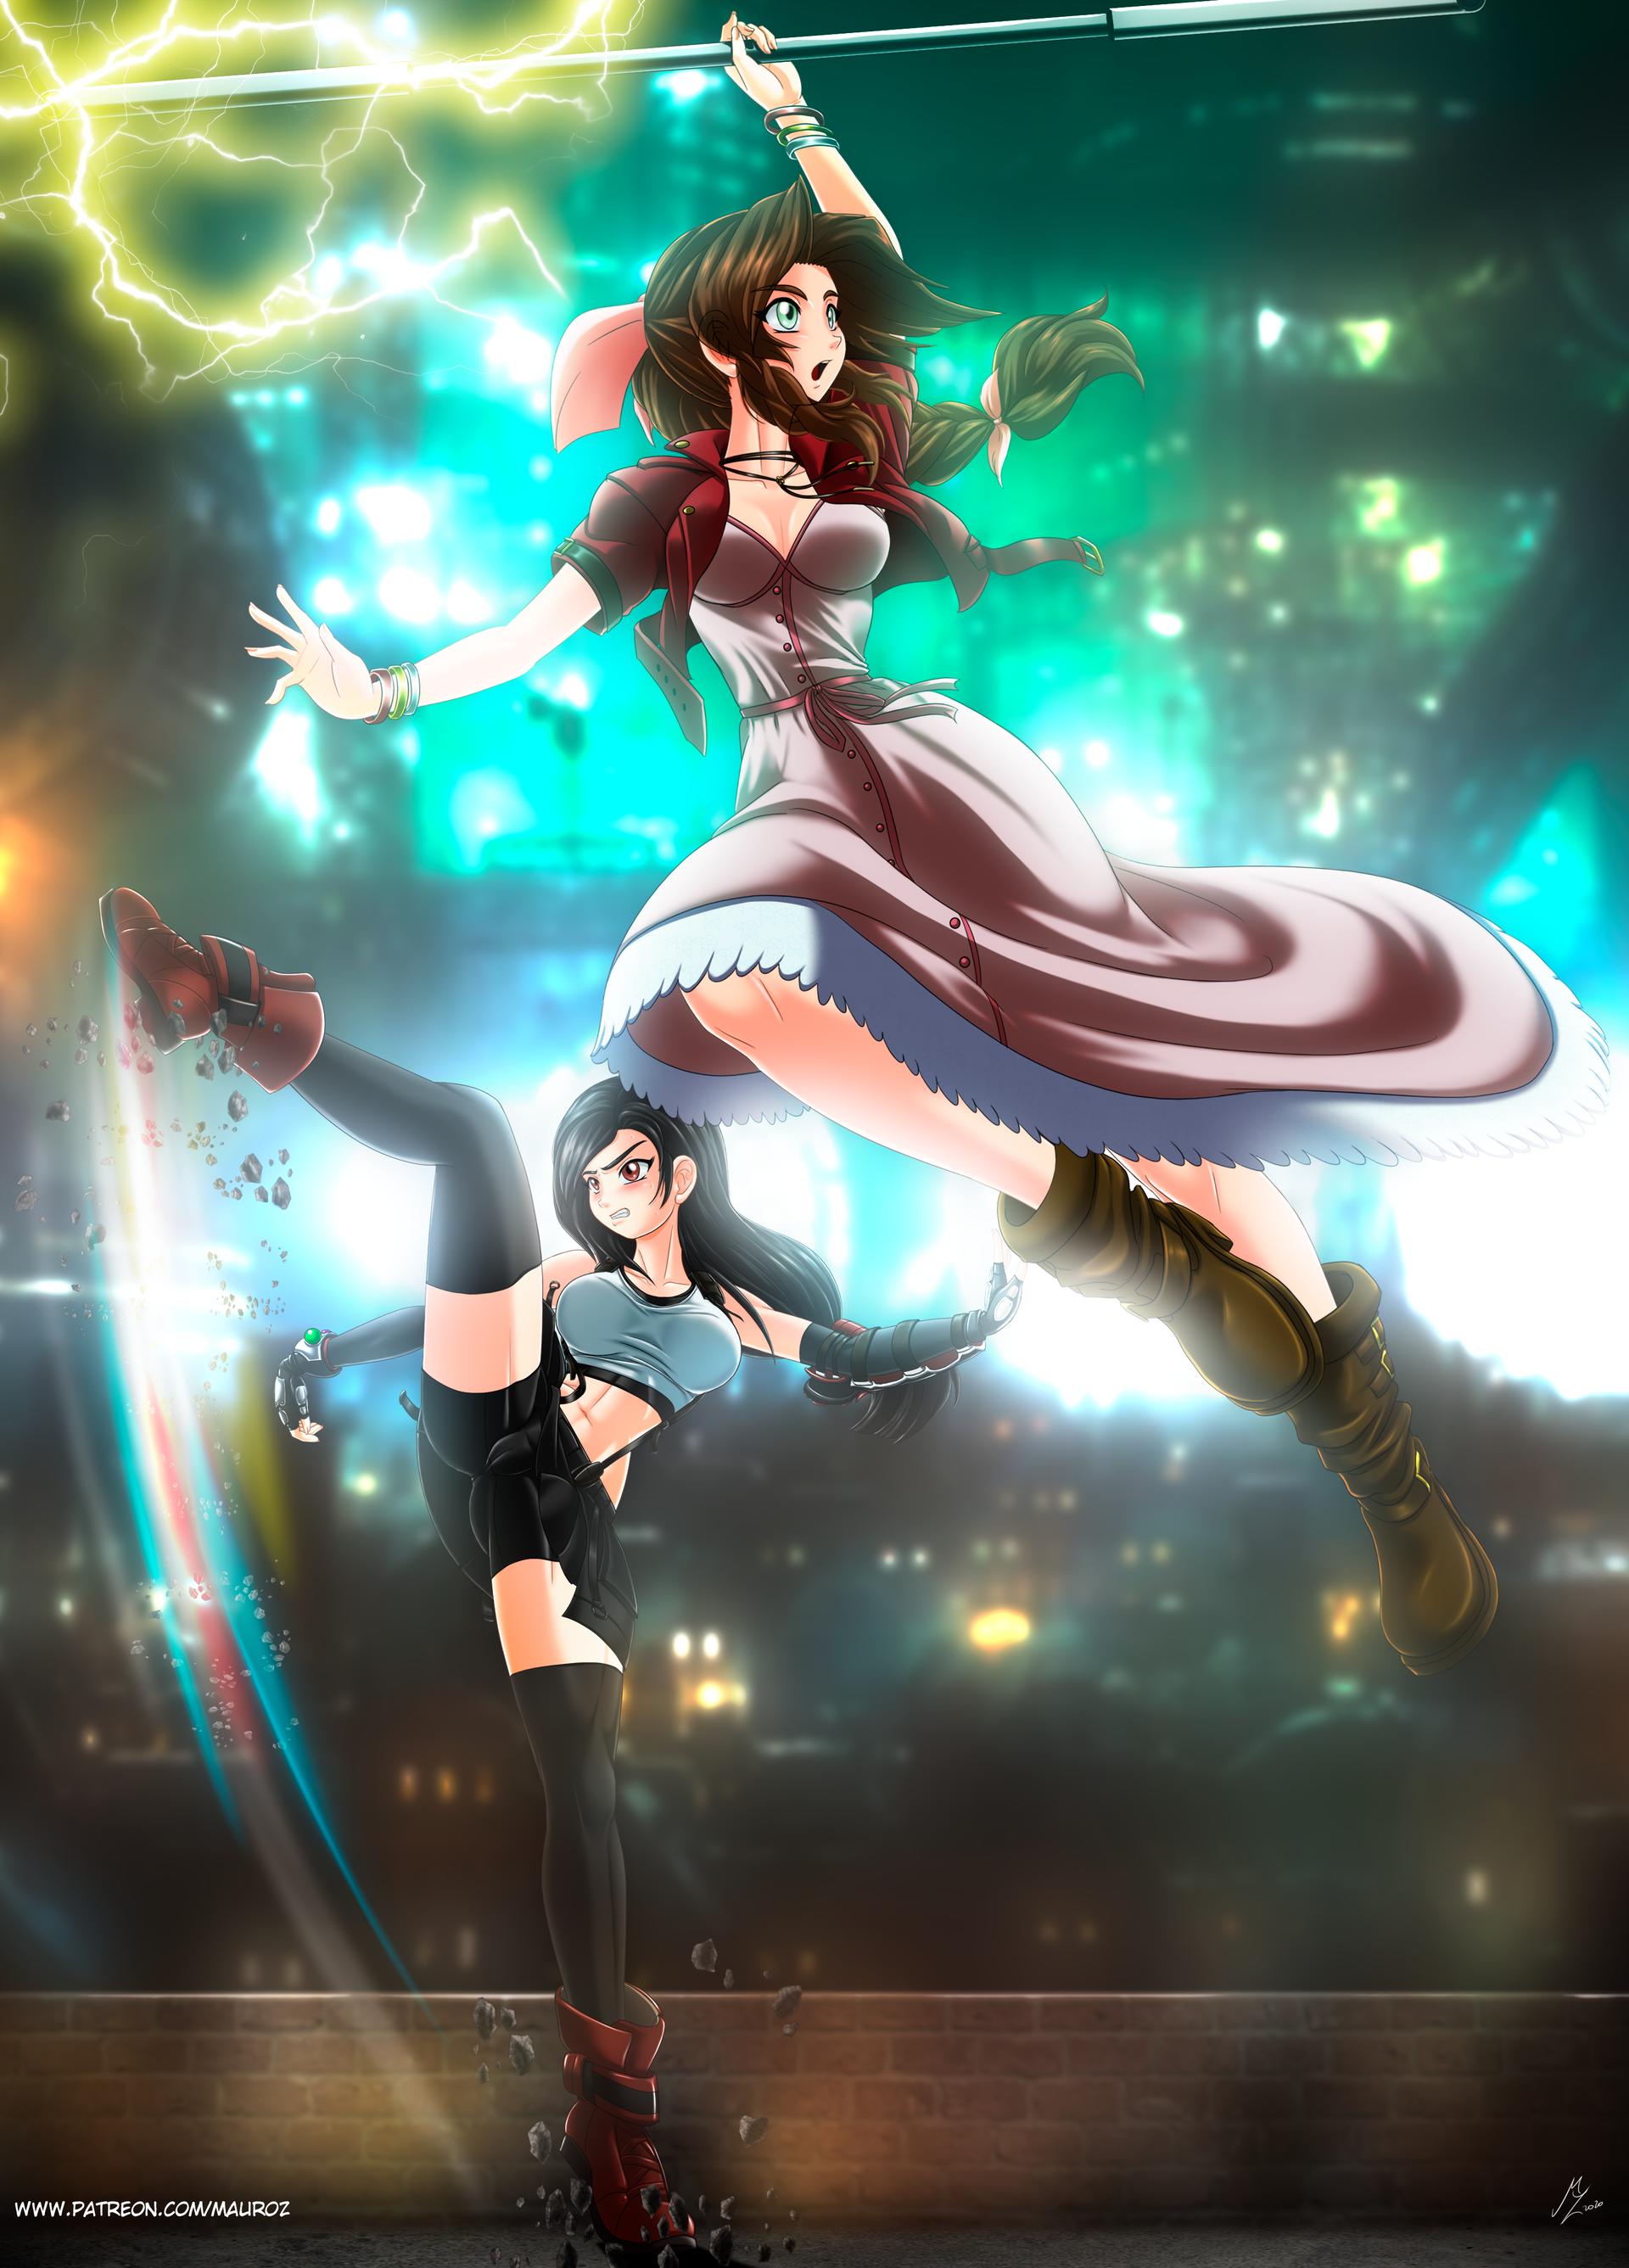 Aerith and Tifa: FF7 remake